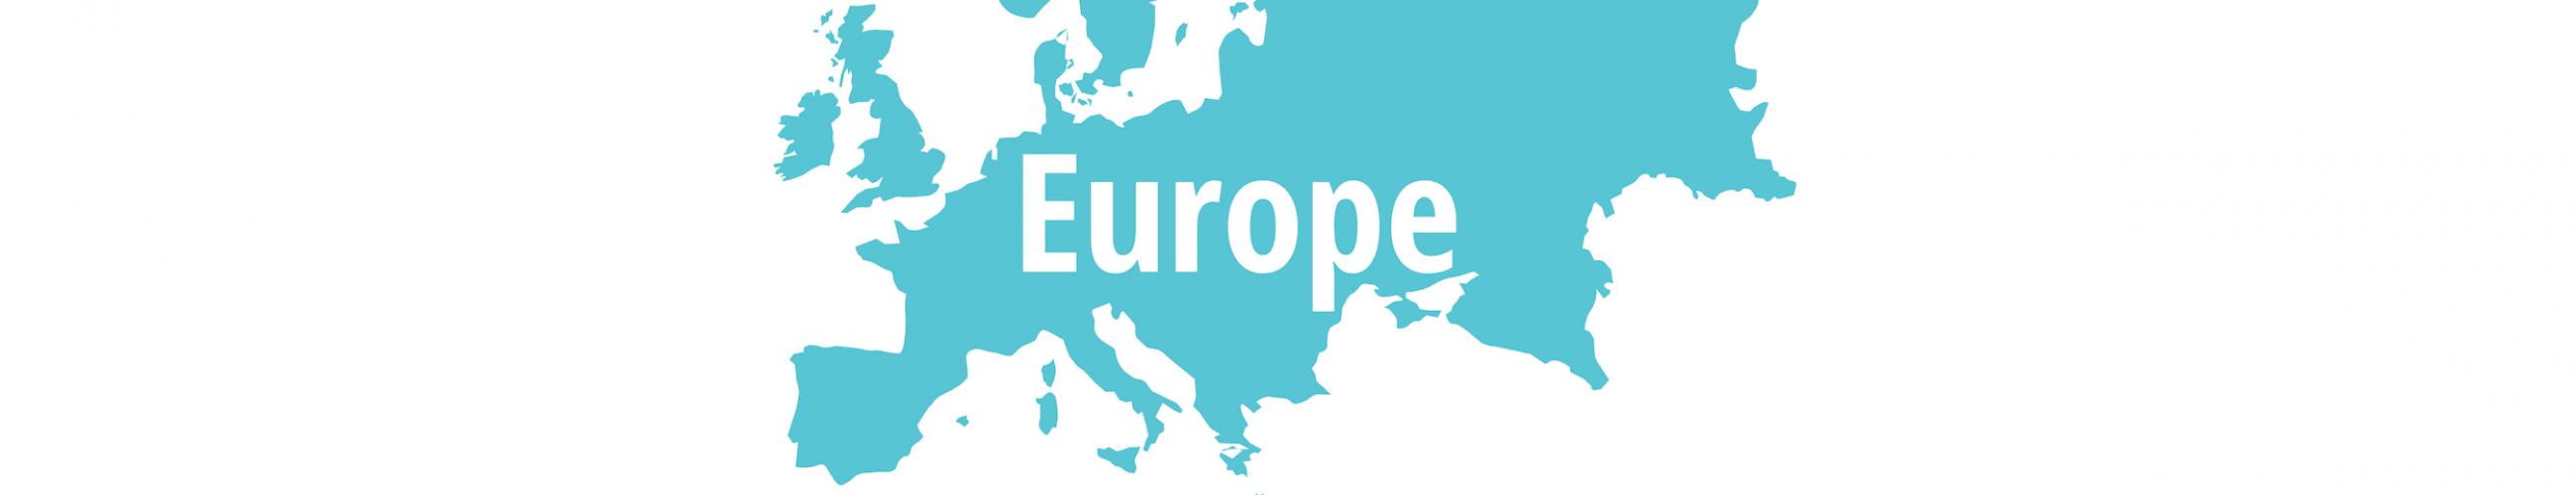 europe best hotels